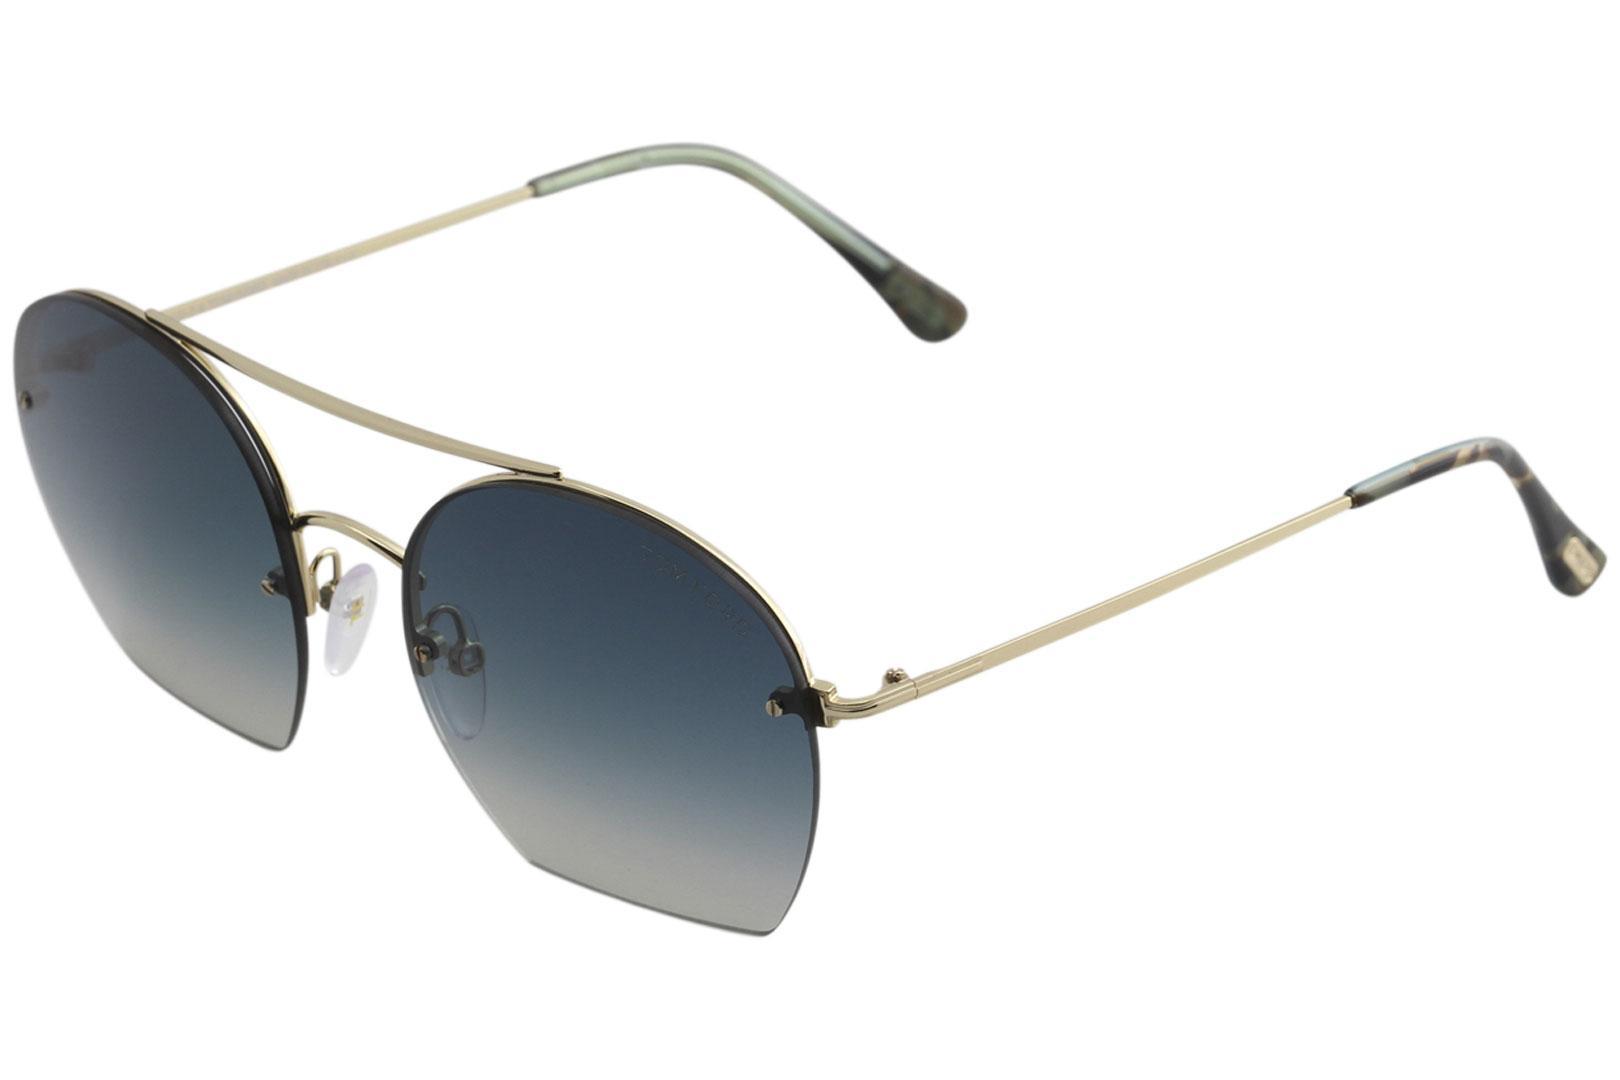 cc5d55a9784 Tom Ford Women s Antonia TF506 TF 506 Fashion Pilot Sunglasses